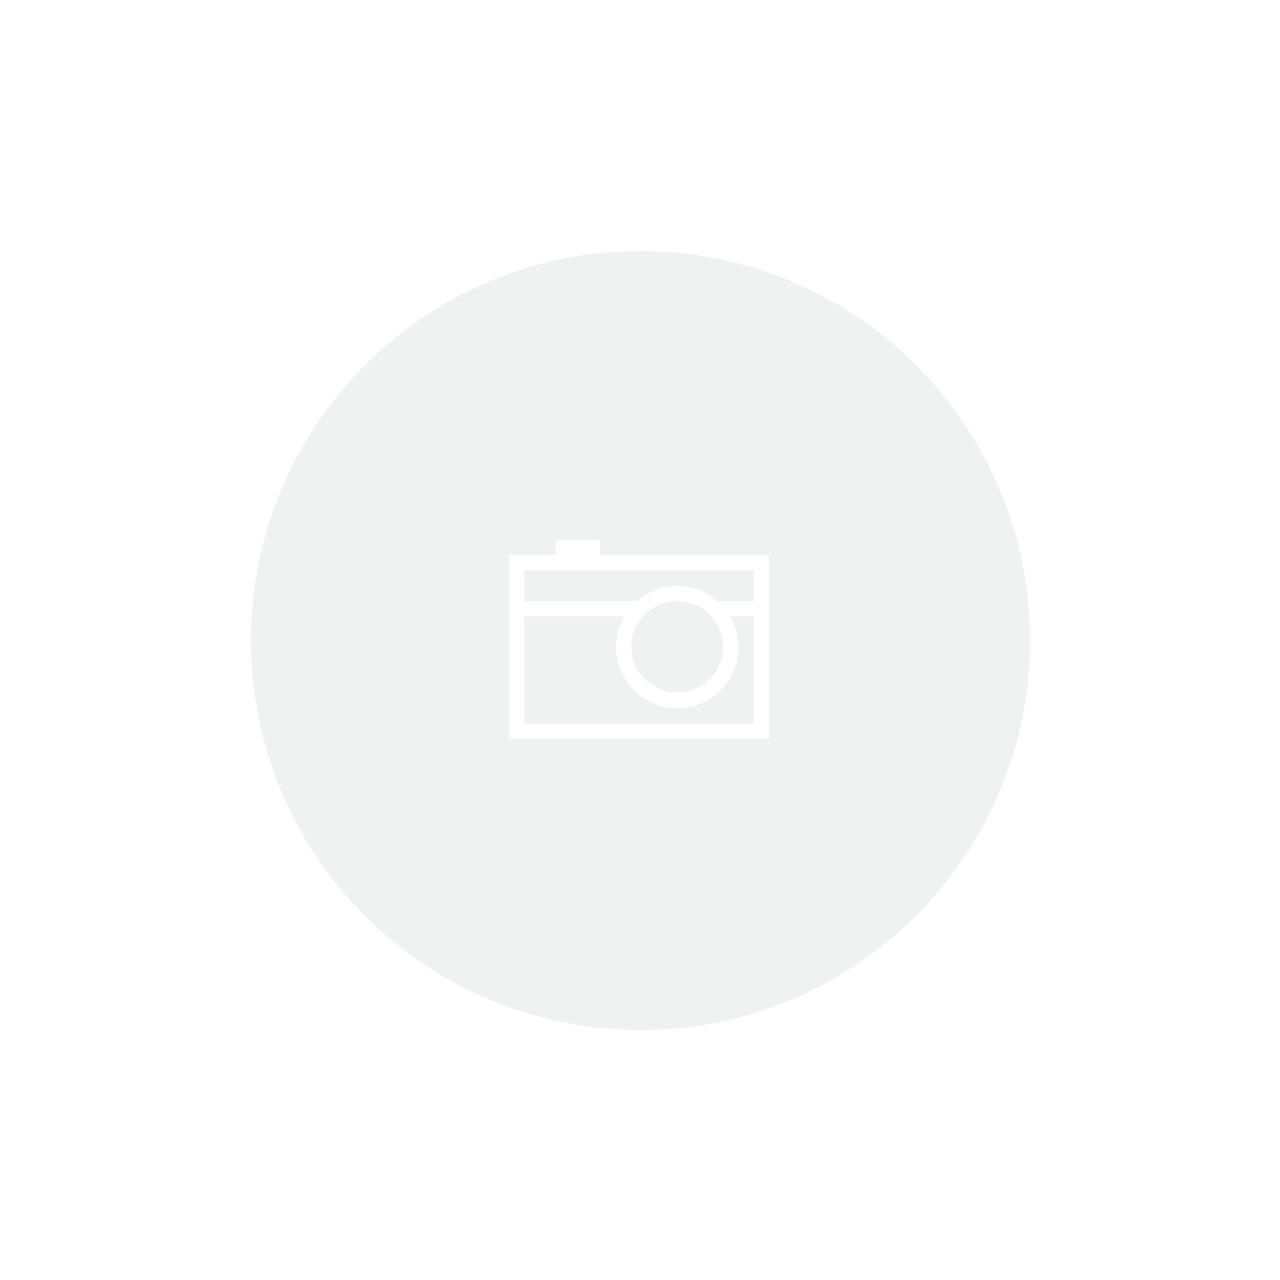 Grelha de Aço Inox com Abertura Lateral 181X462Mm Tramontina